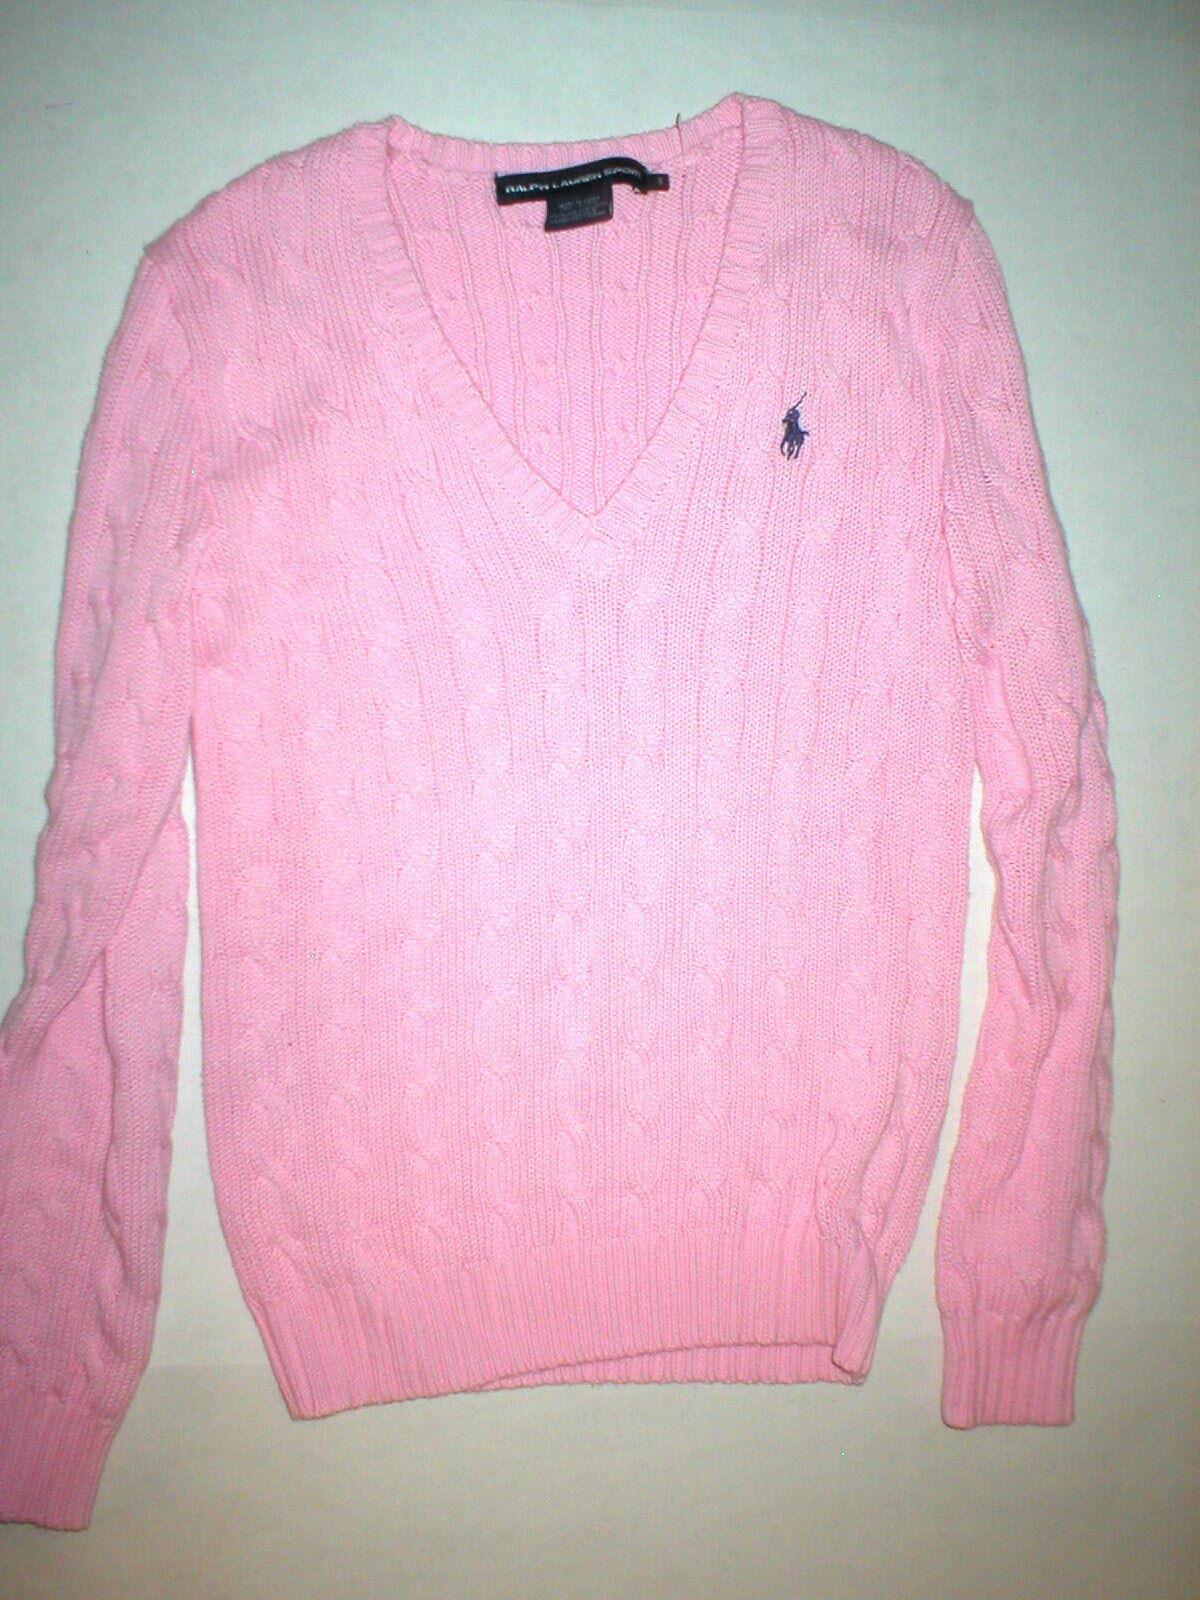 New Womens Ralph Lauren Sport Sweater Top Small Pink Casual S Pretty Chain Twist